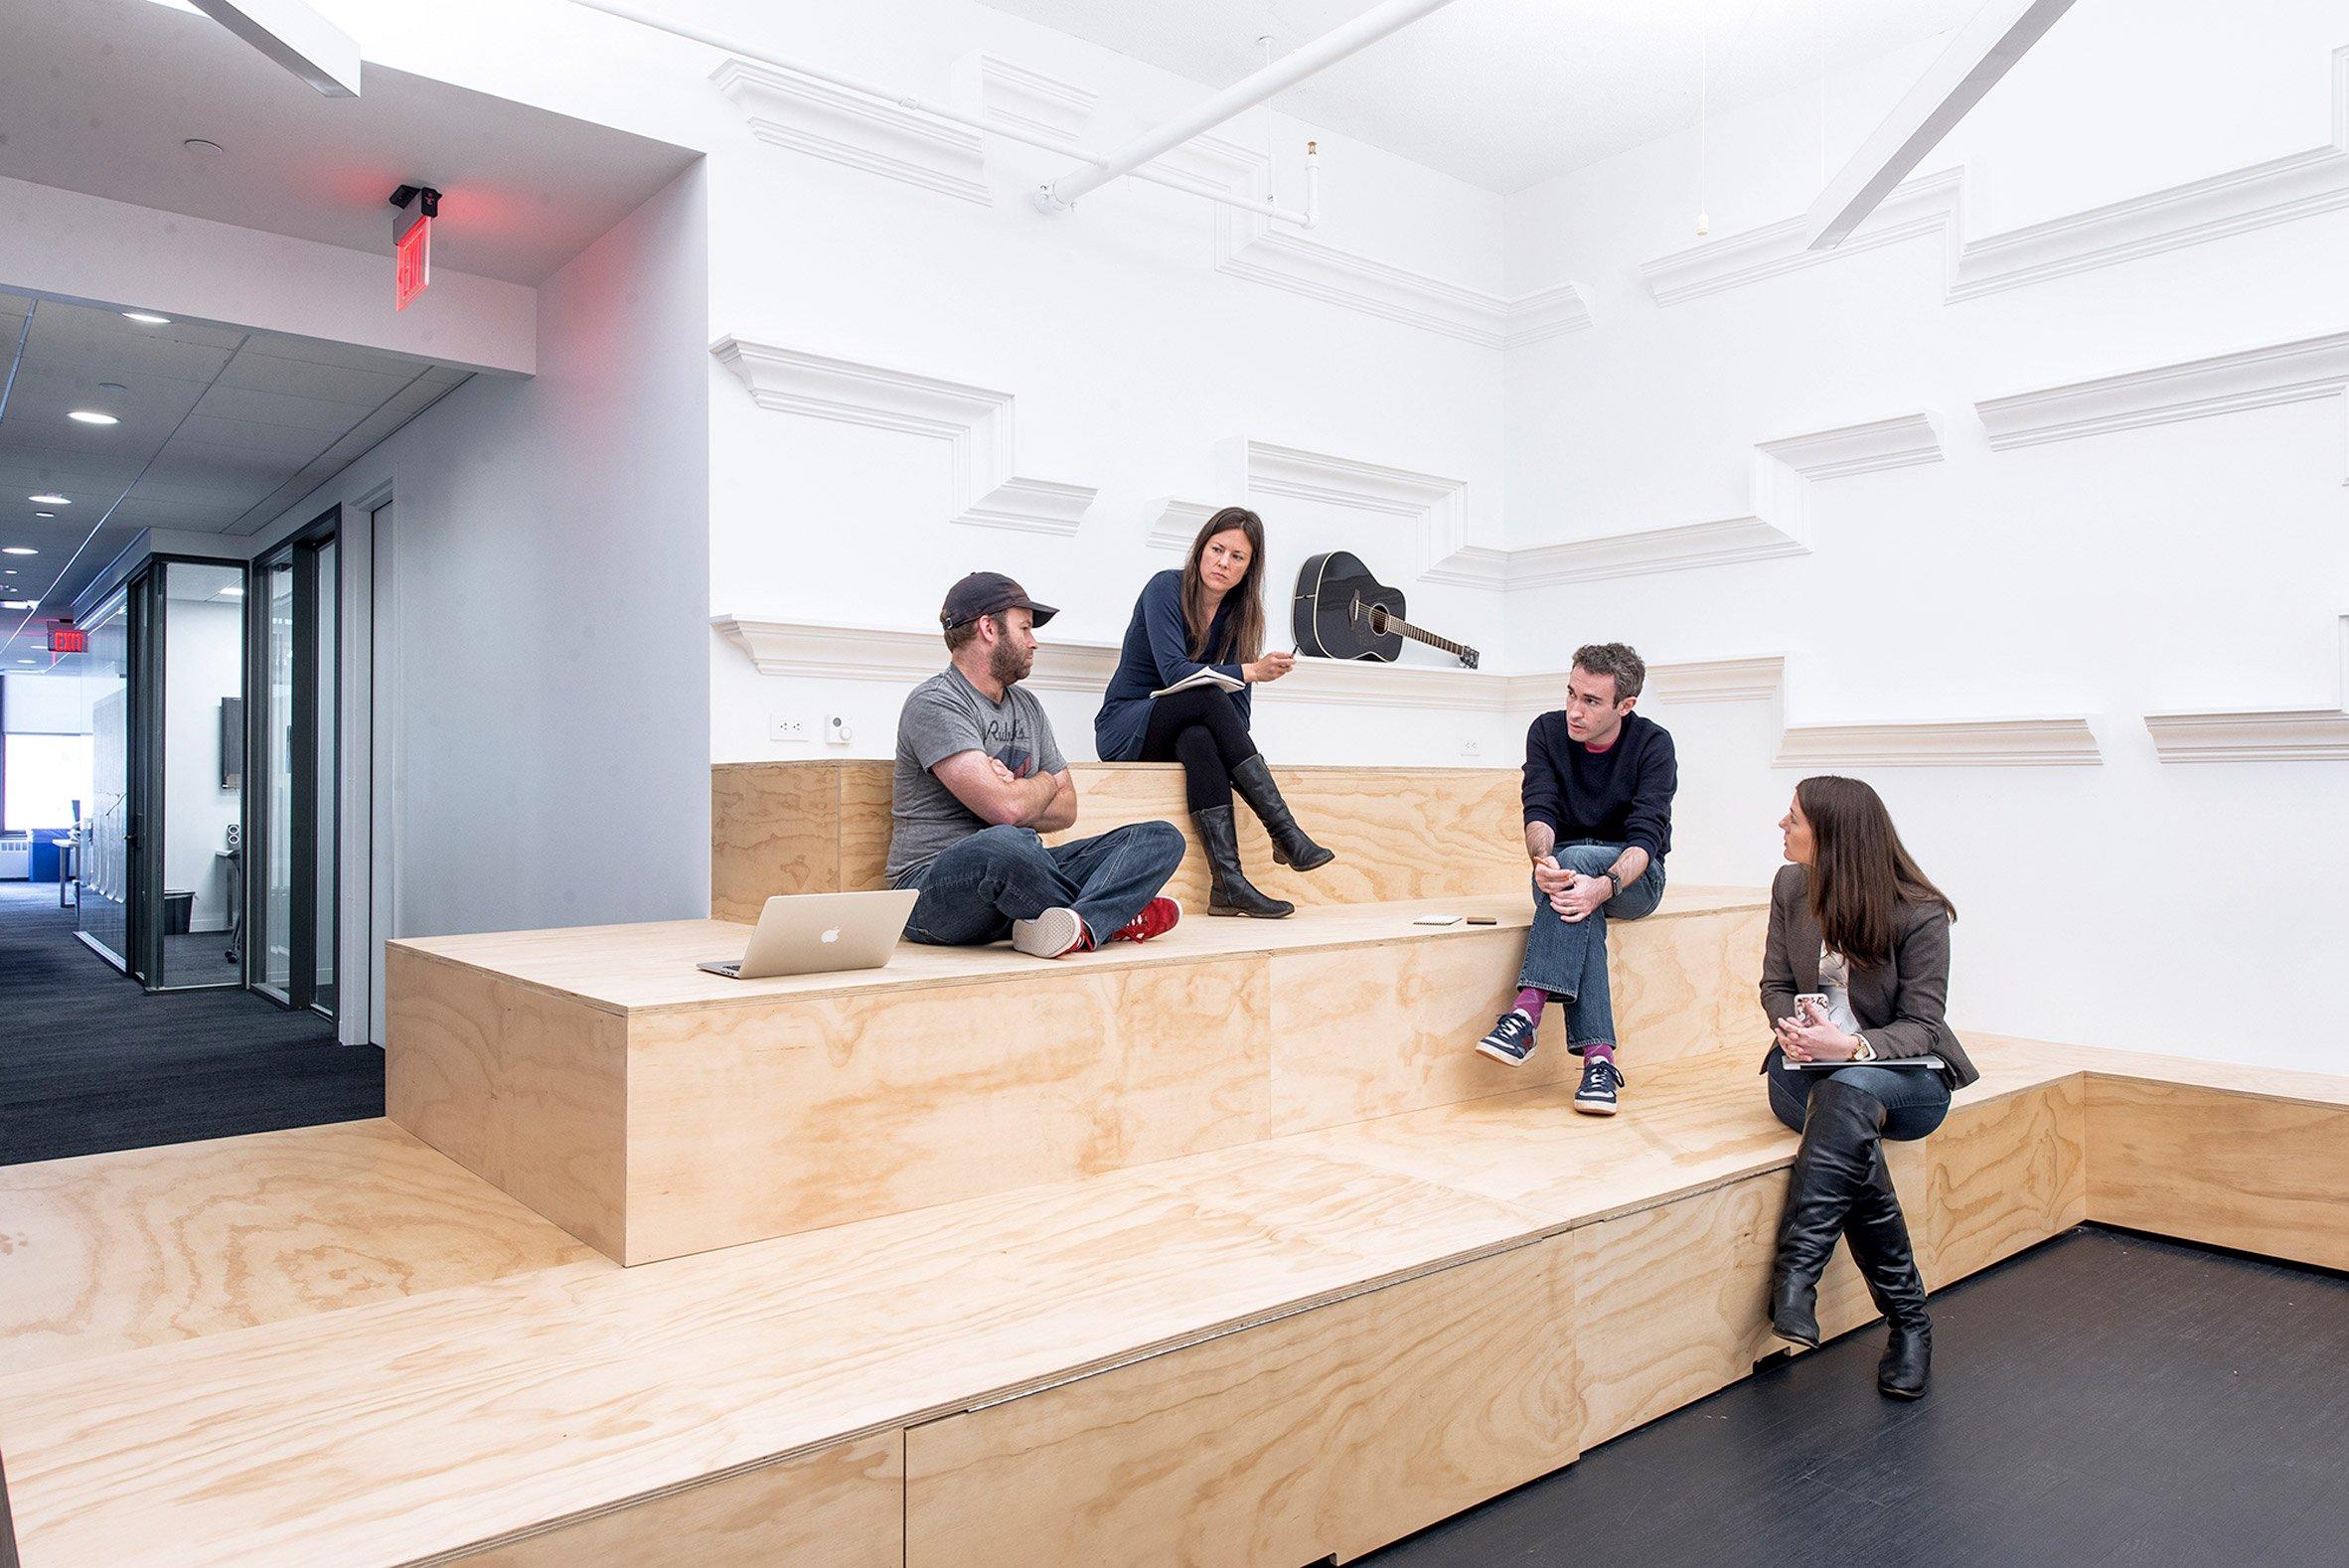 architecture-interiors-offices- manhatten-new-york-design-studia-osnovadesign-osnova-poltava_08